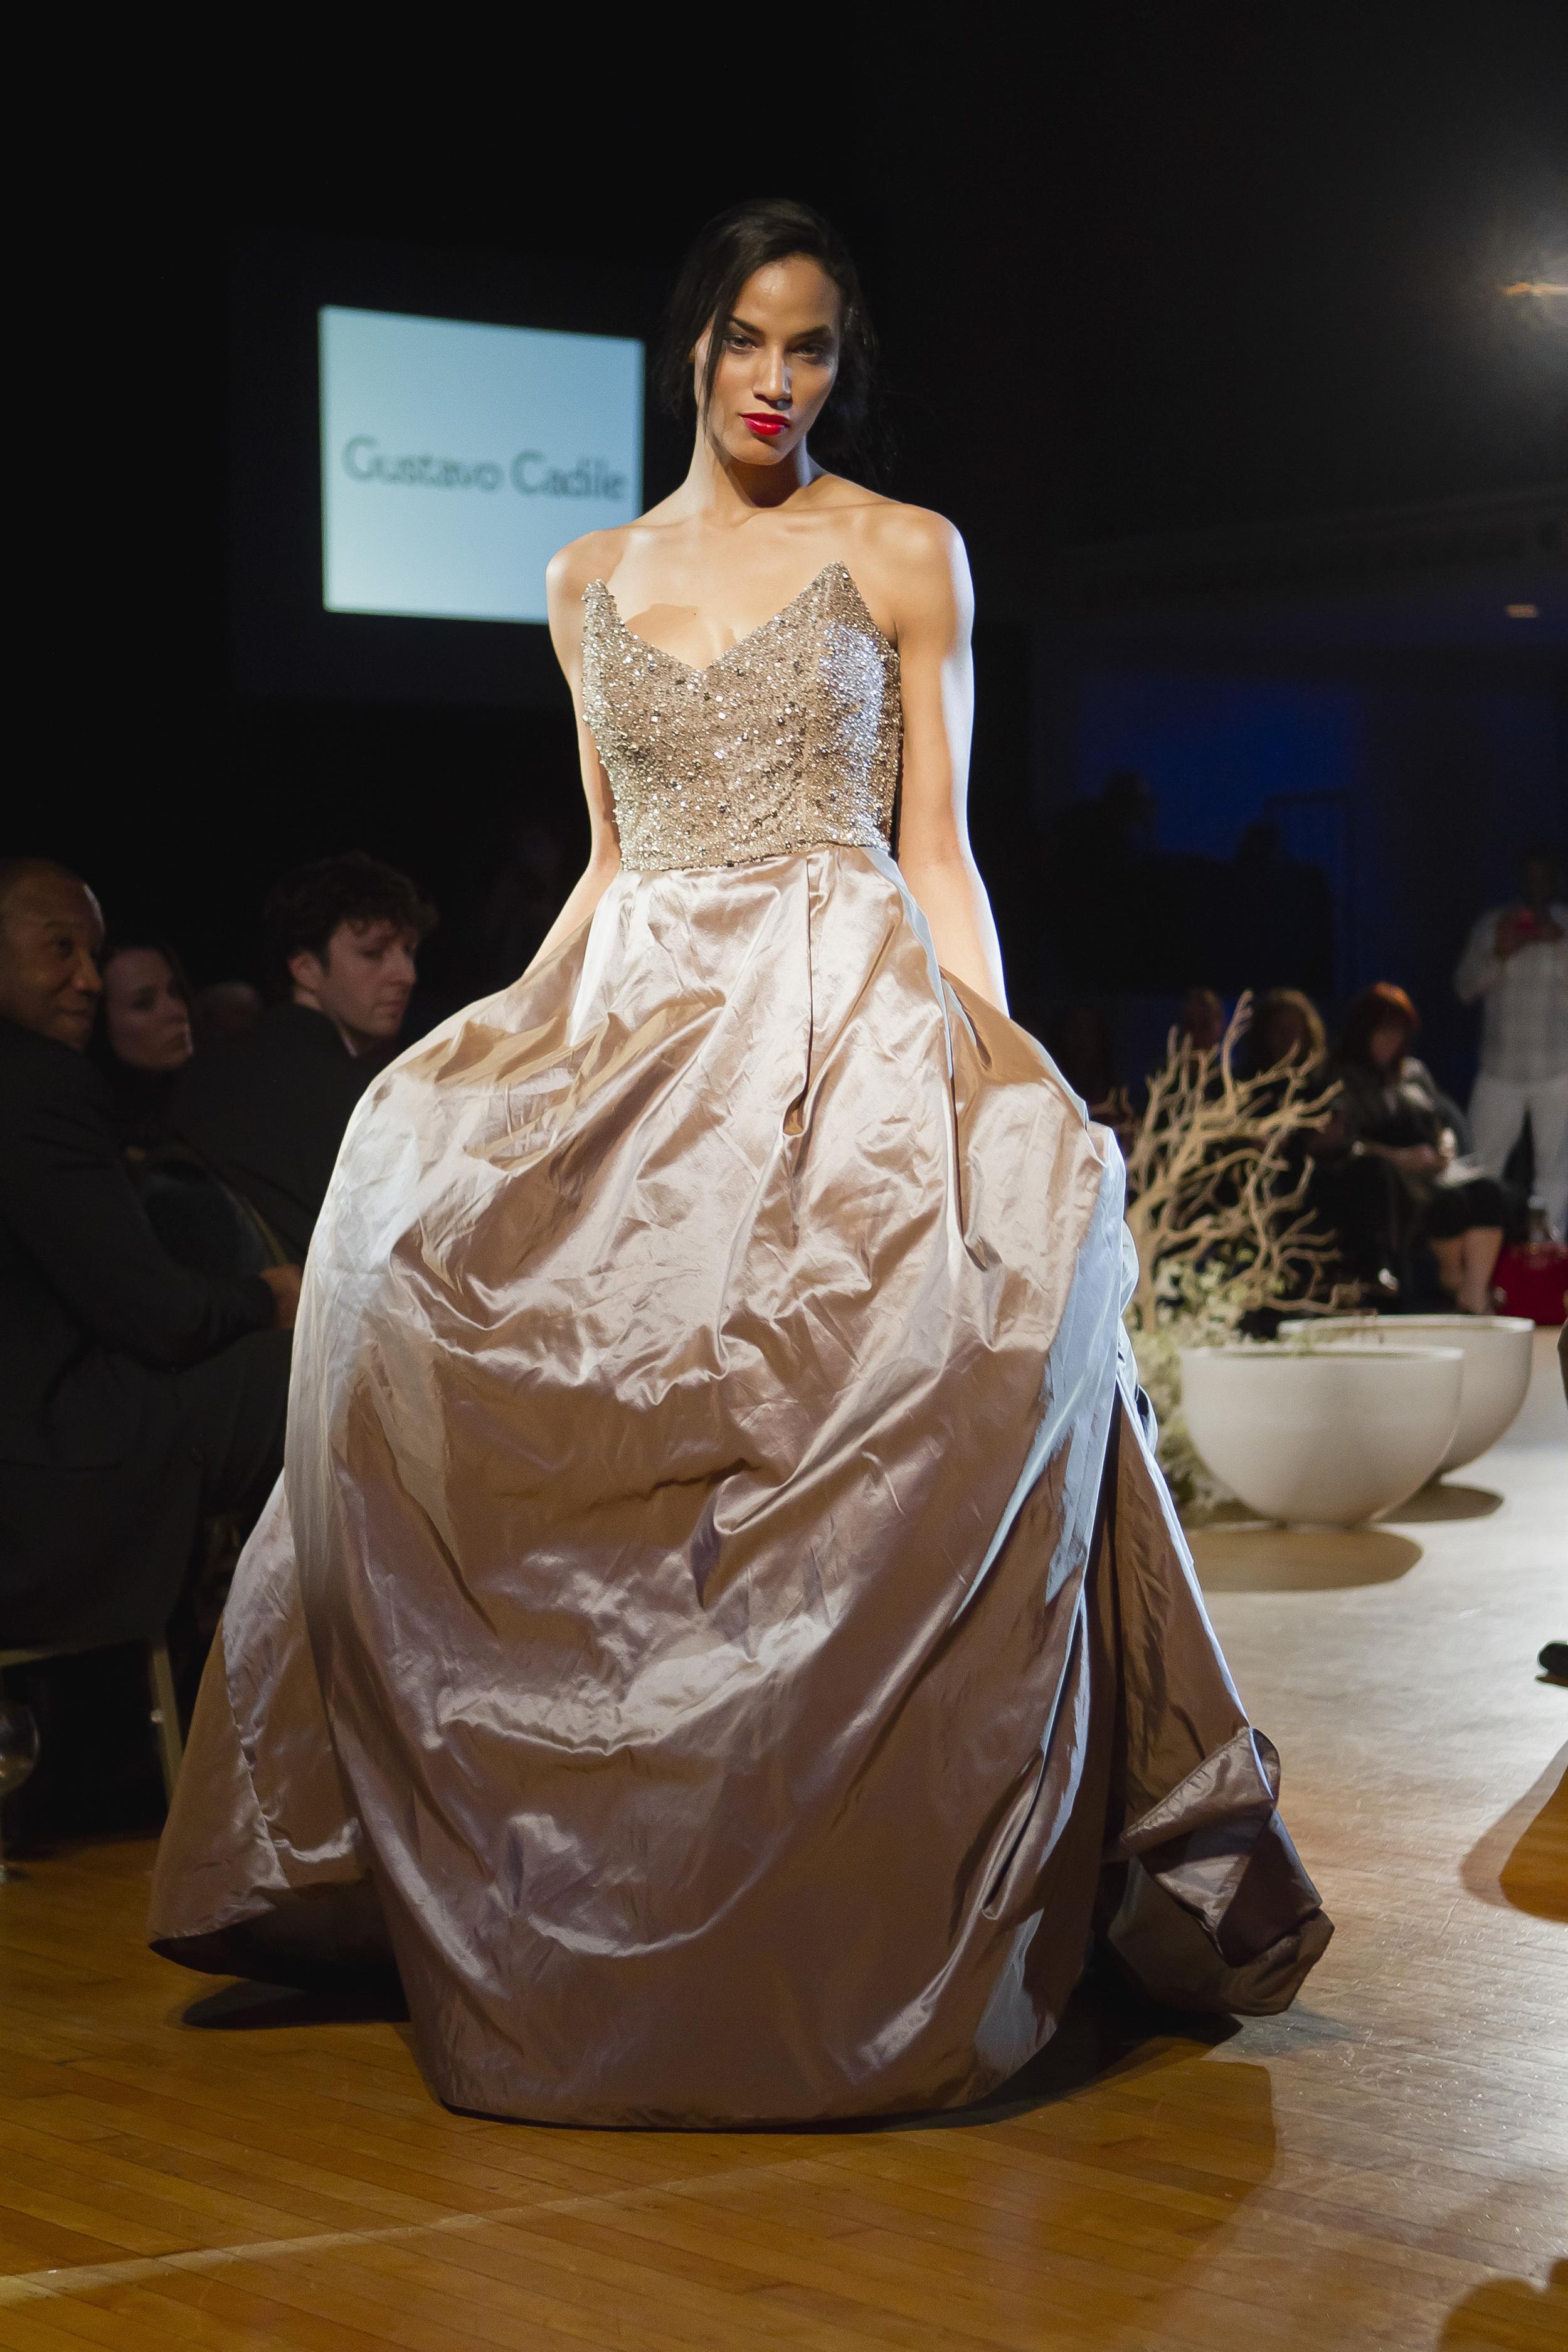 NFW Alumni 2011 — Nashville Fashion Week